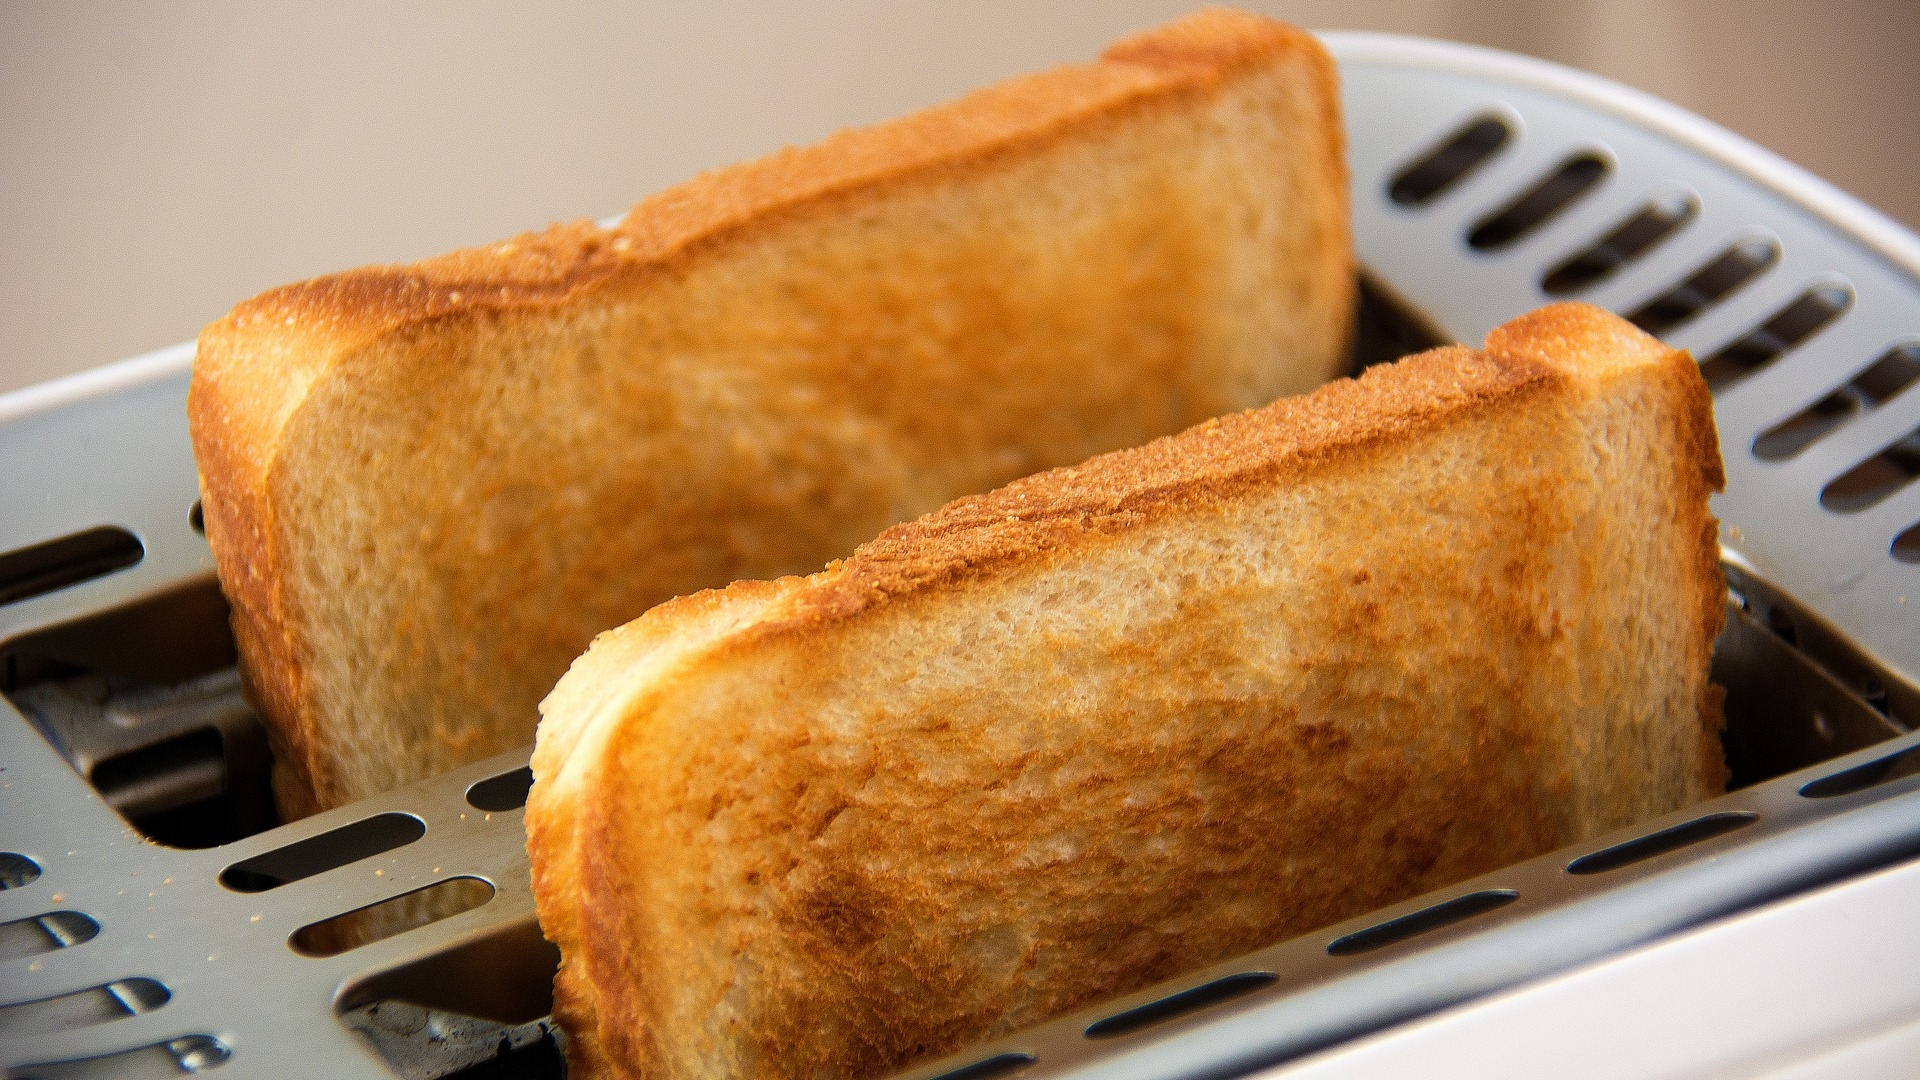 tostadas en una tostadora